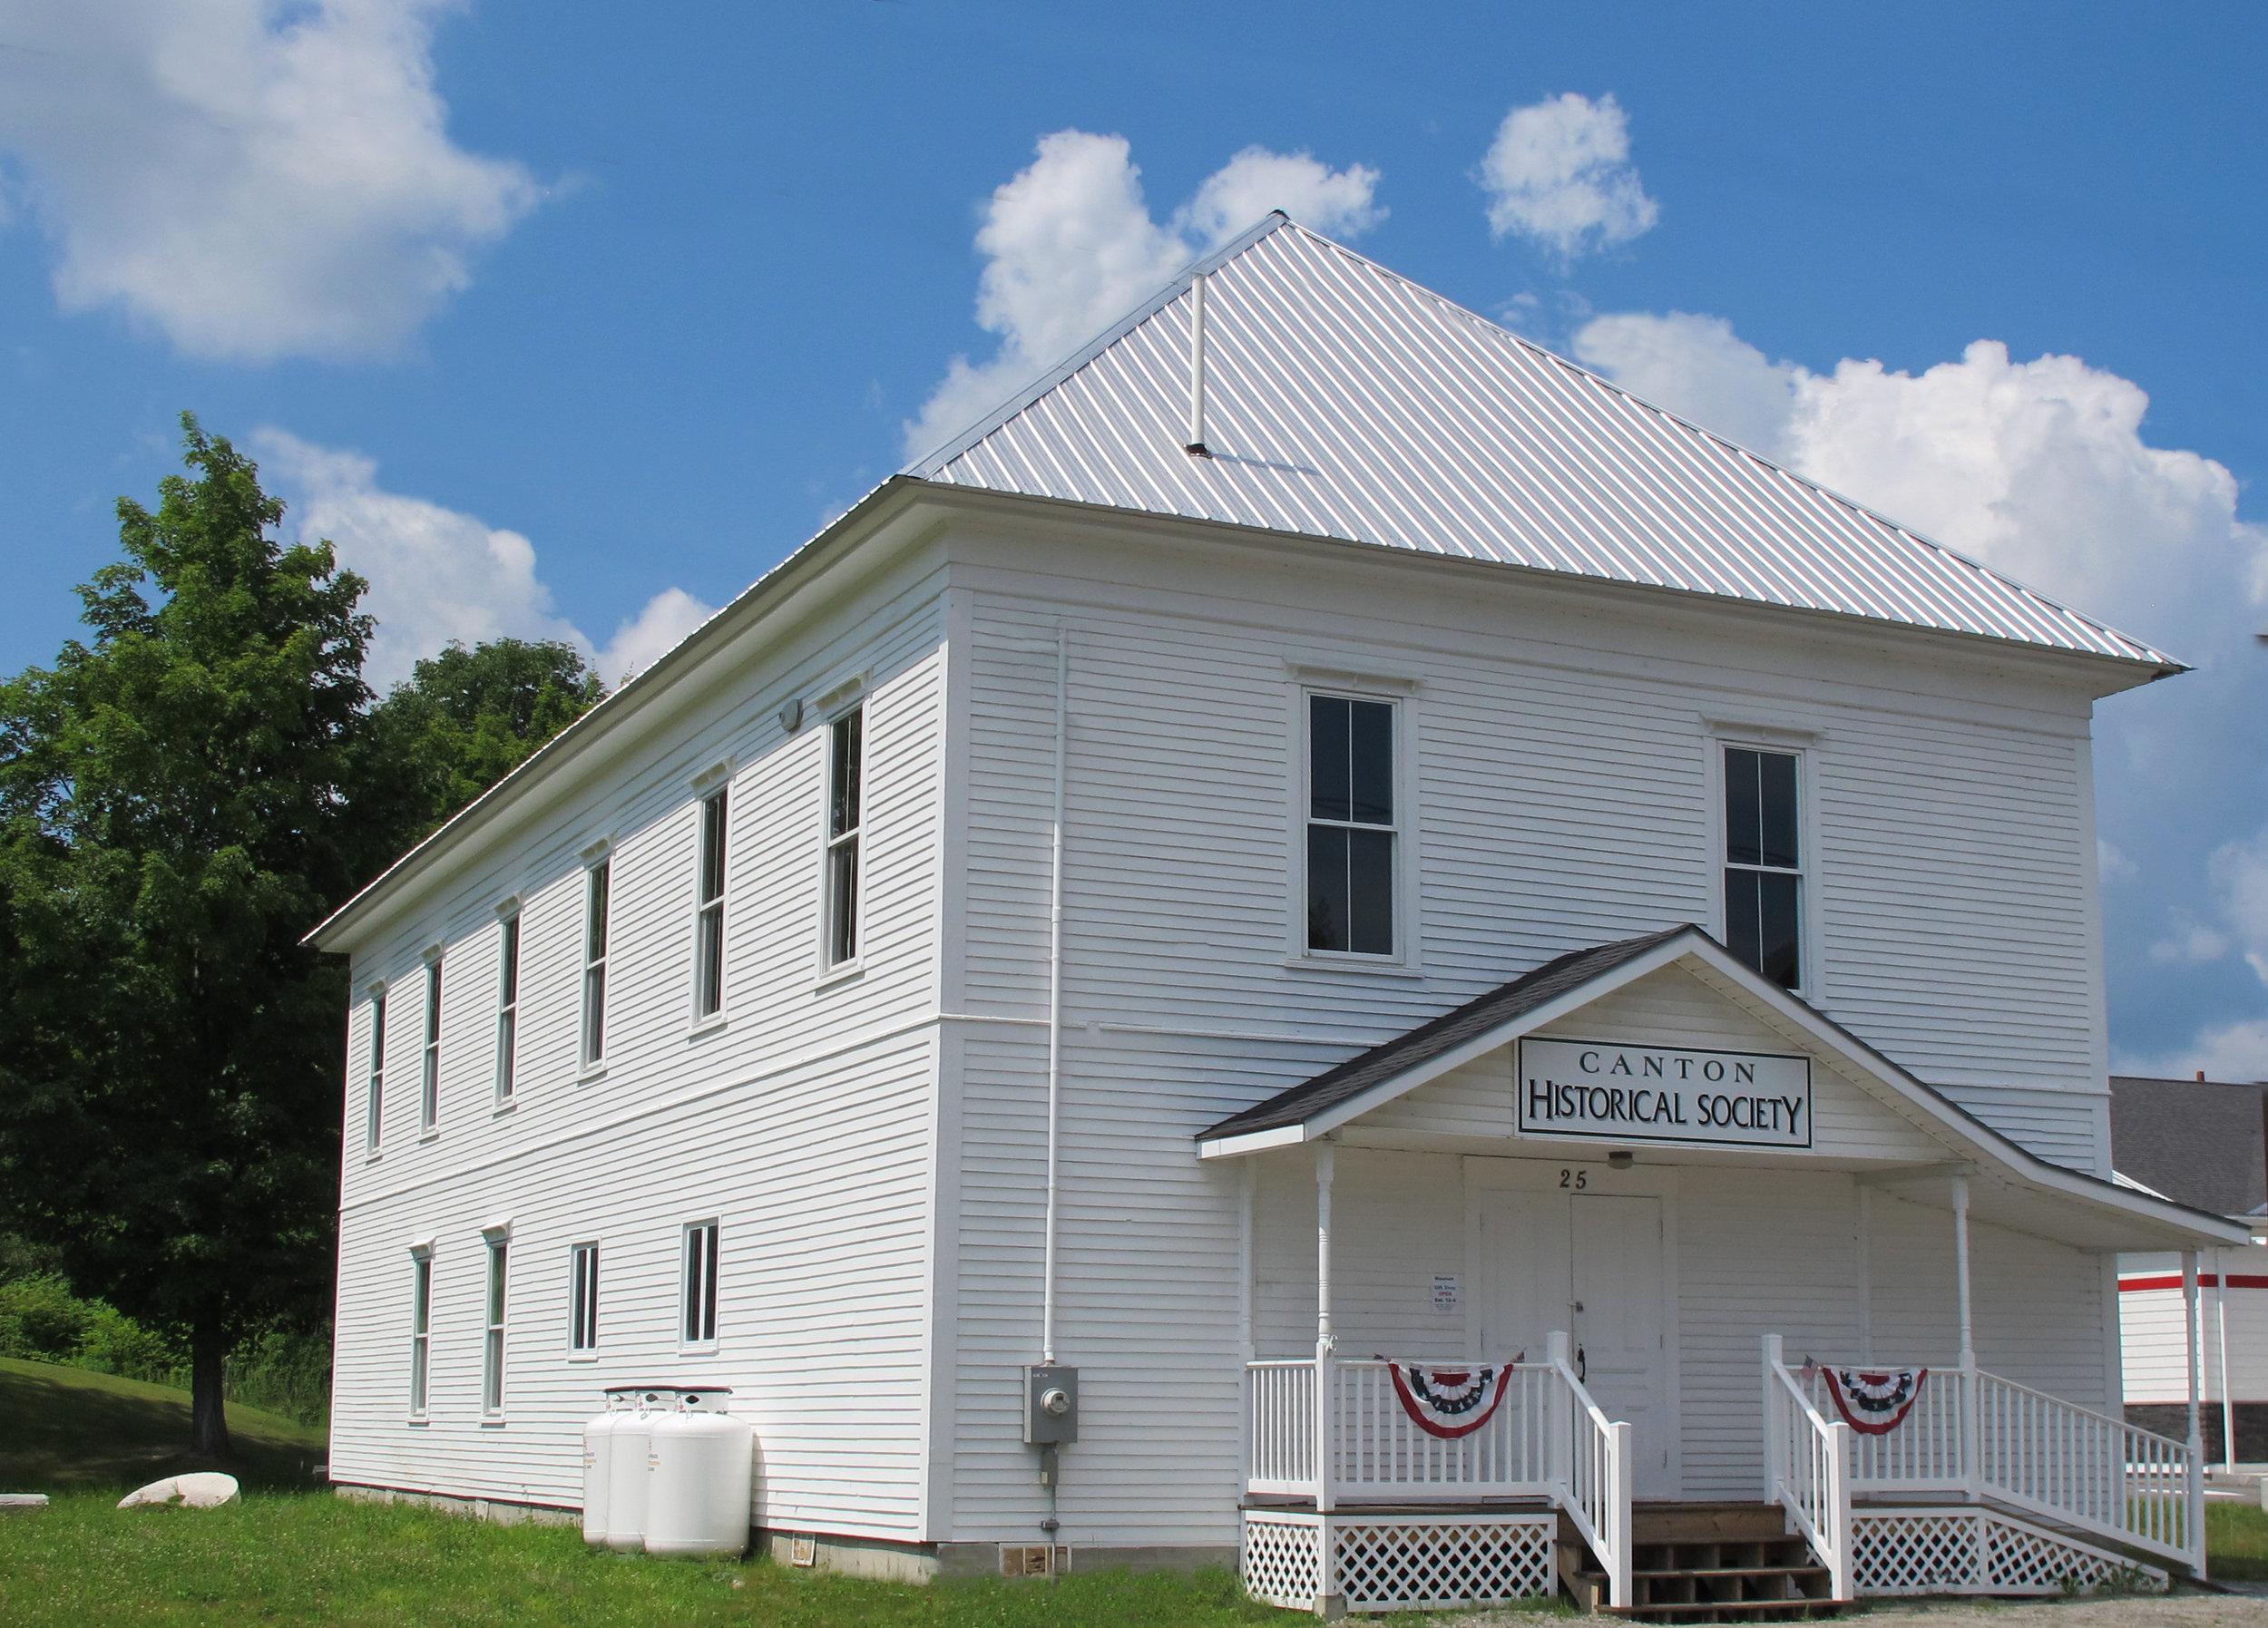 Canton Historical Society